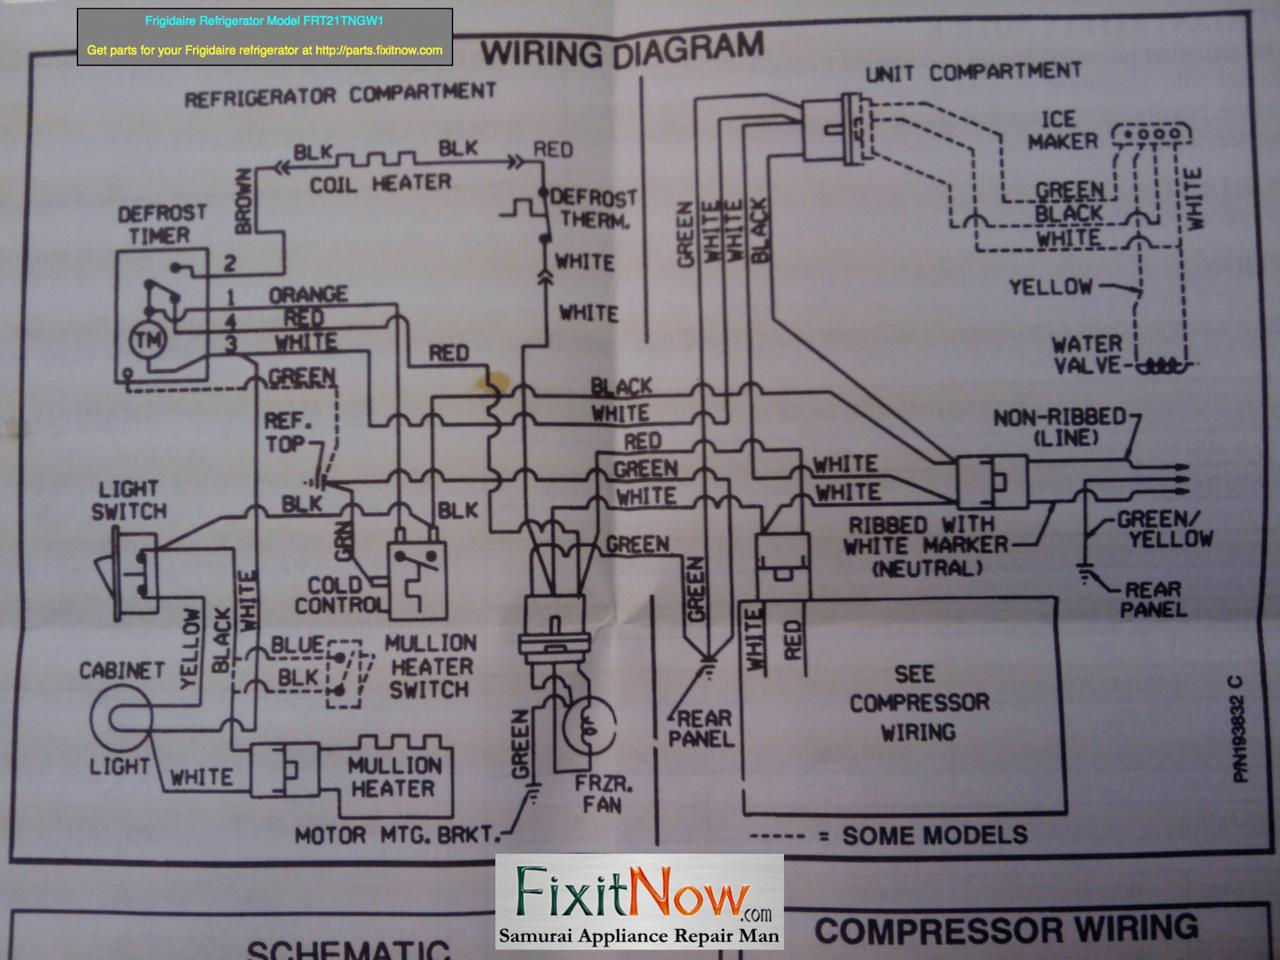 4927632513_66c123c922_o X2 frigidaire affinity dryer wiring diagram frigidaire affinity dryer wiring diagram at bayanpartner.co